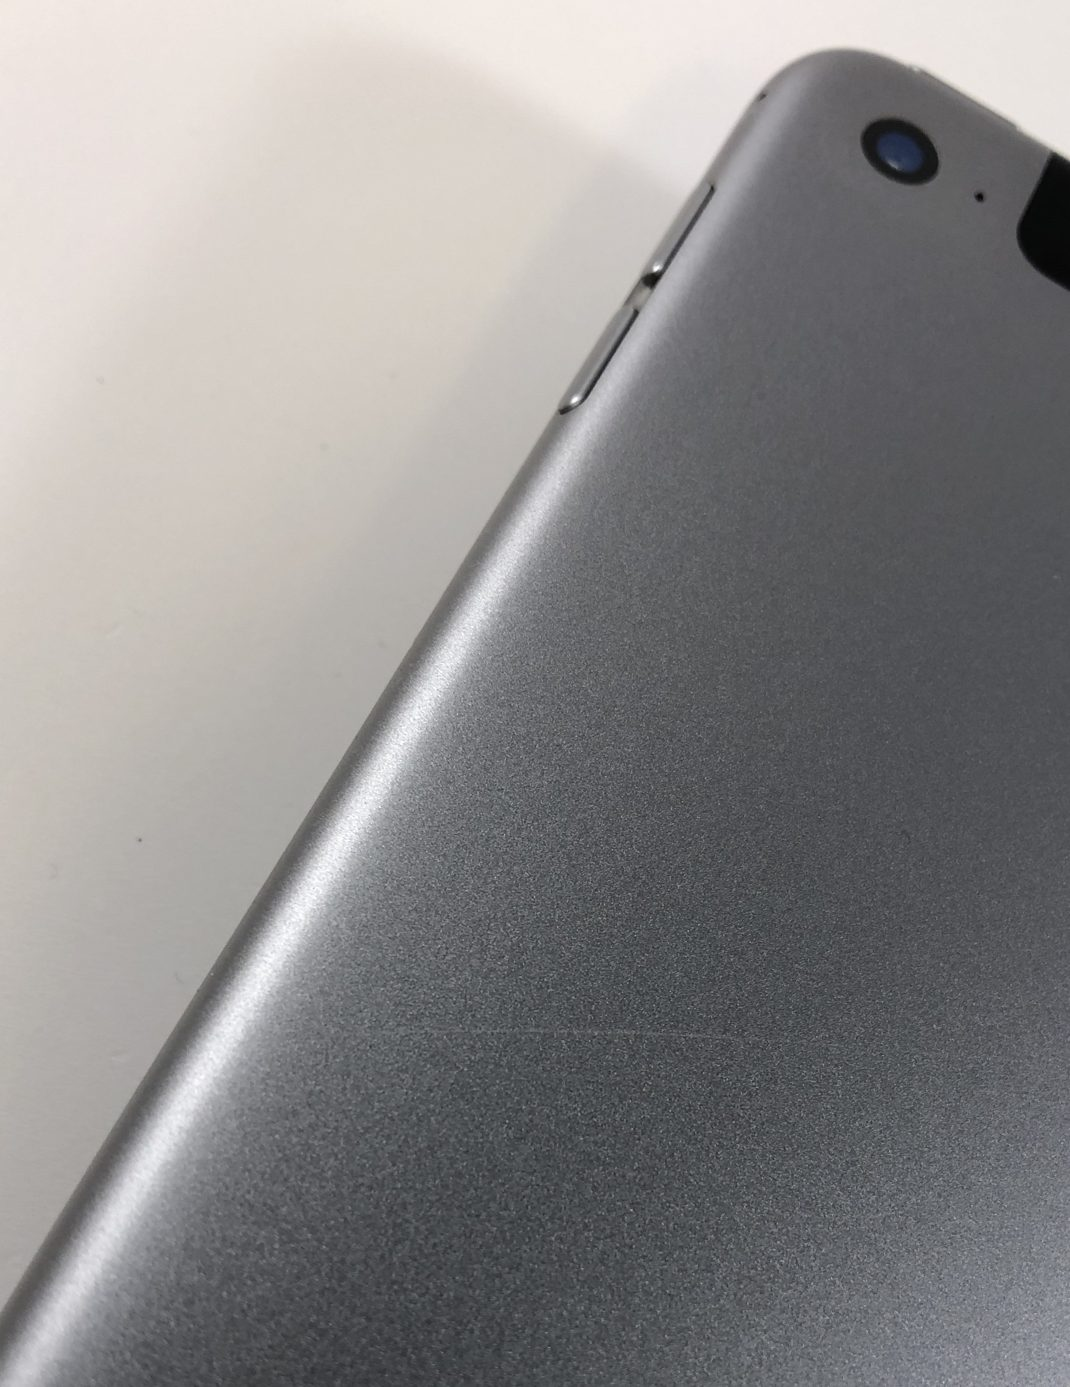 iPad Air 2 Wi-Fi + Cellular 64GB, 64GB, Space Gray, Kuva 3